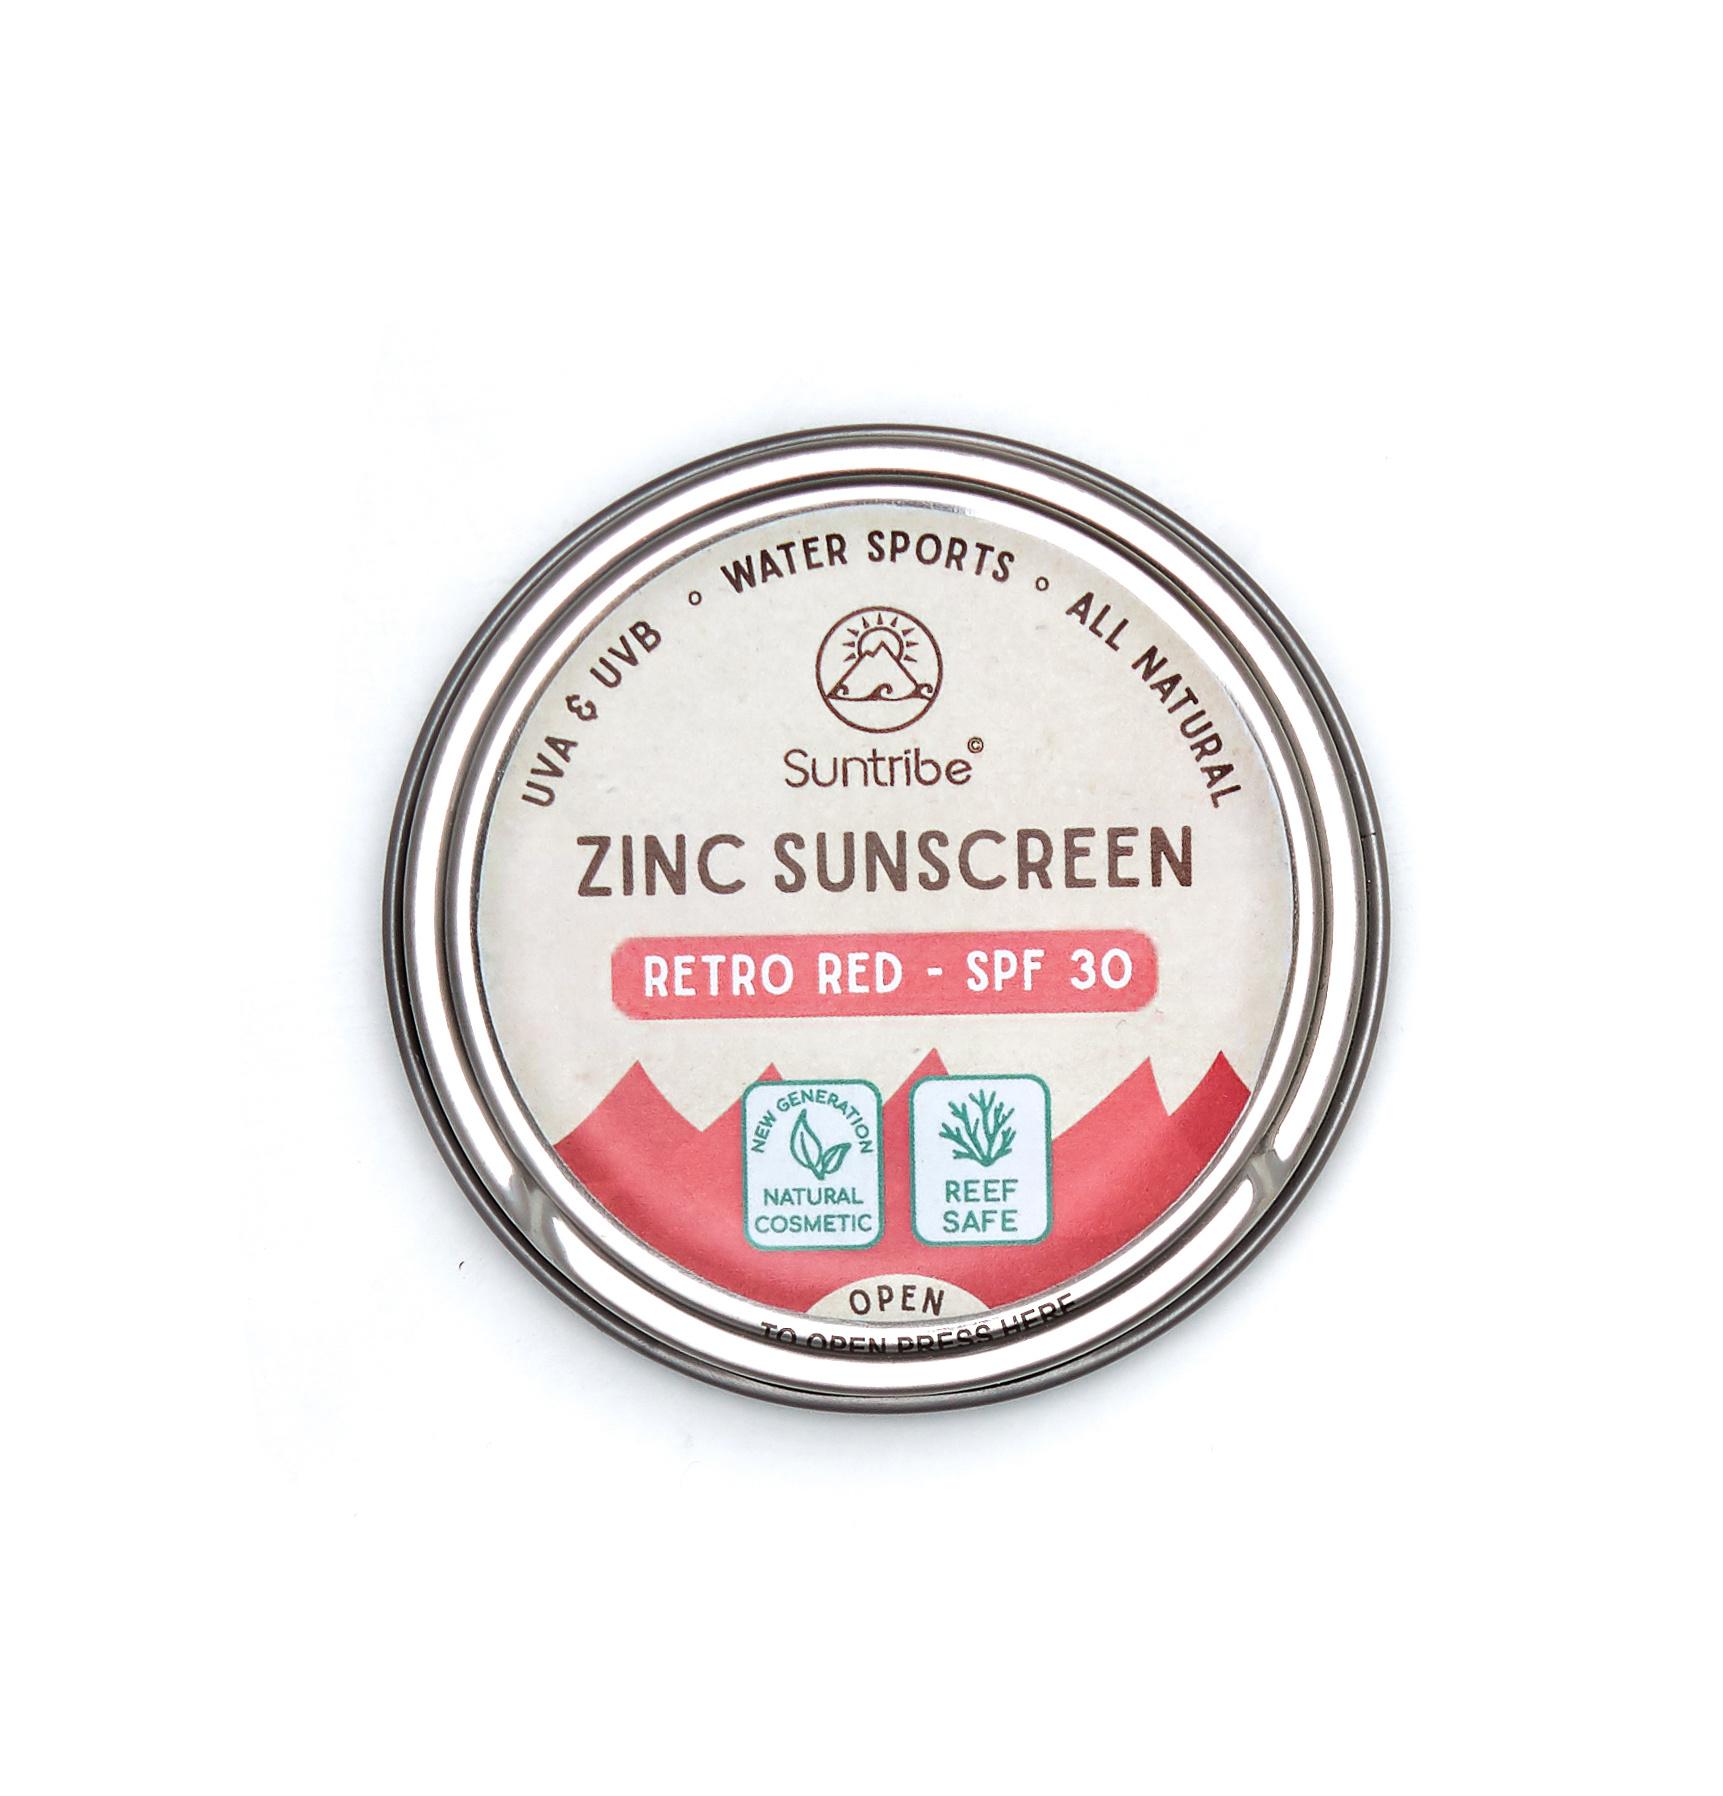 Suntribe Zinc Sunscreen Tinted - Retro Red - 30SPF